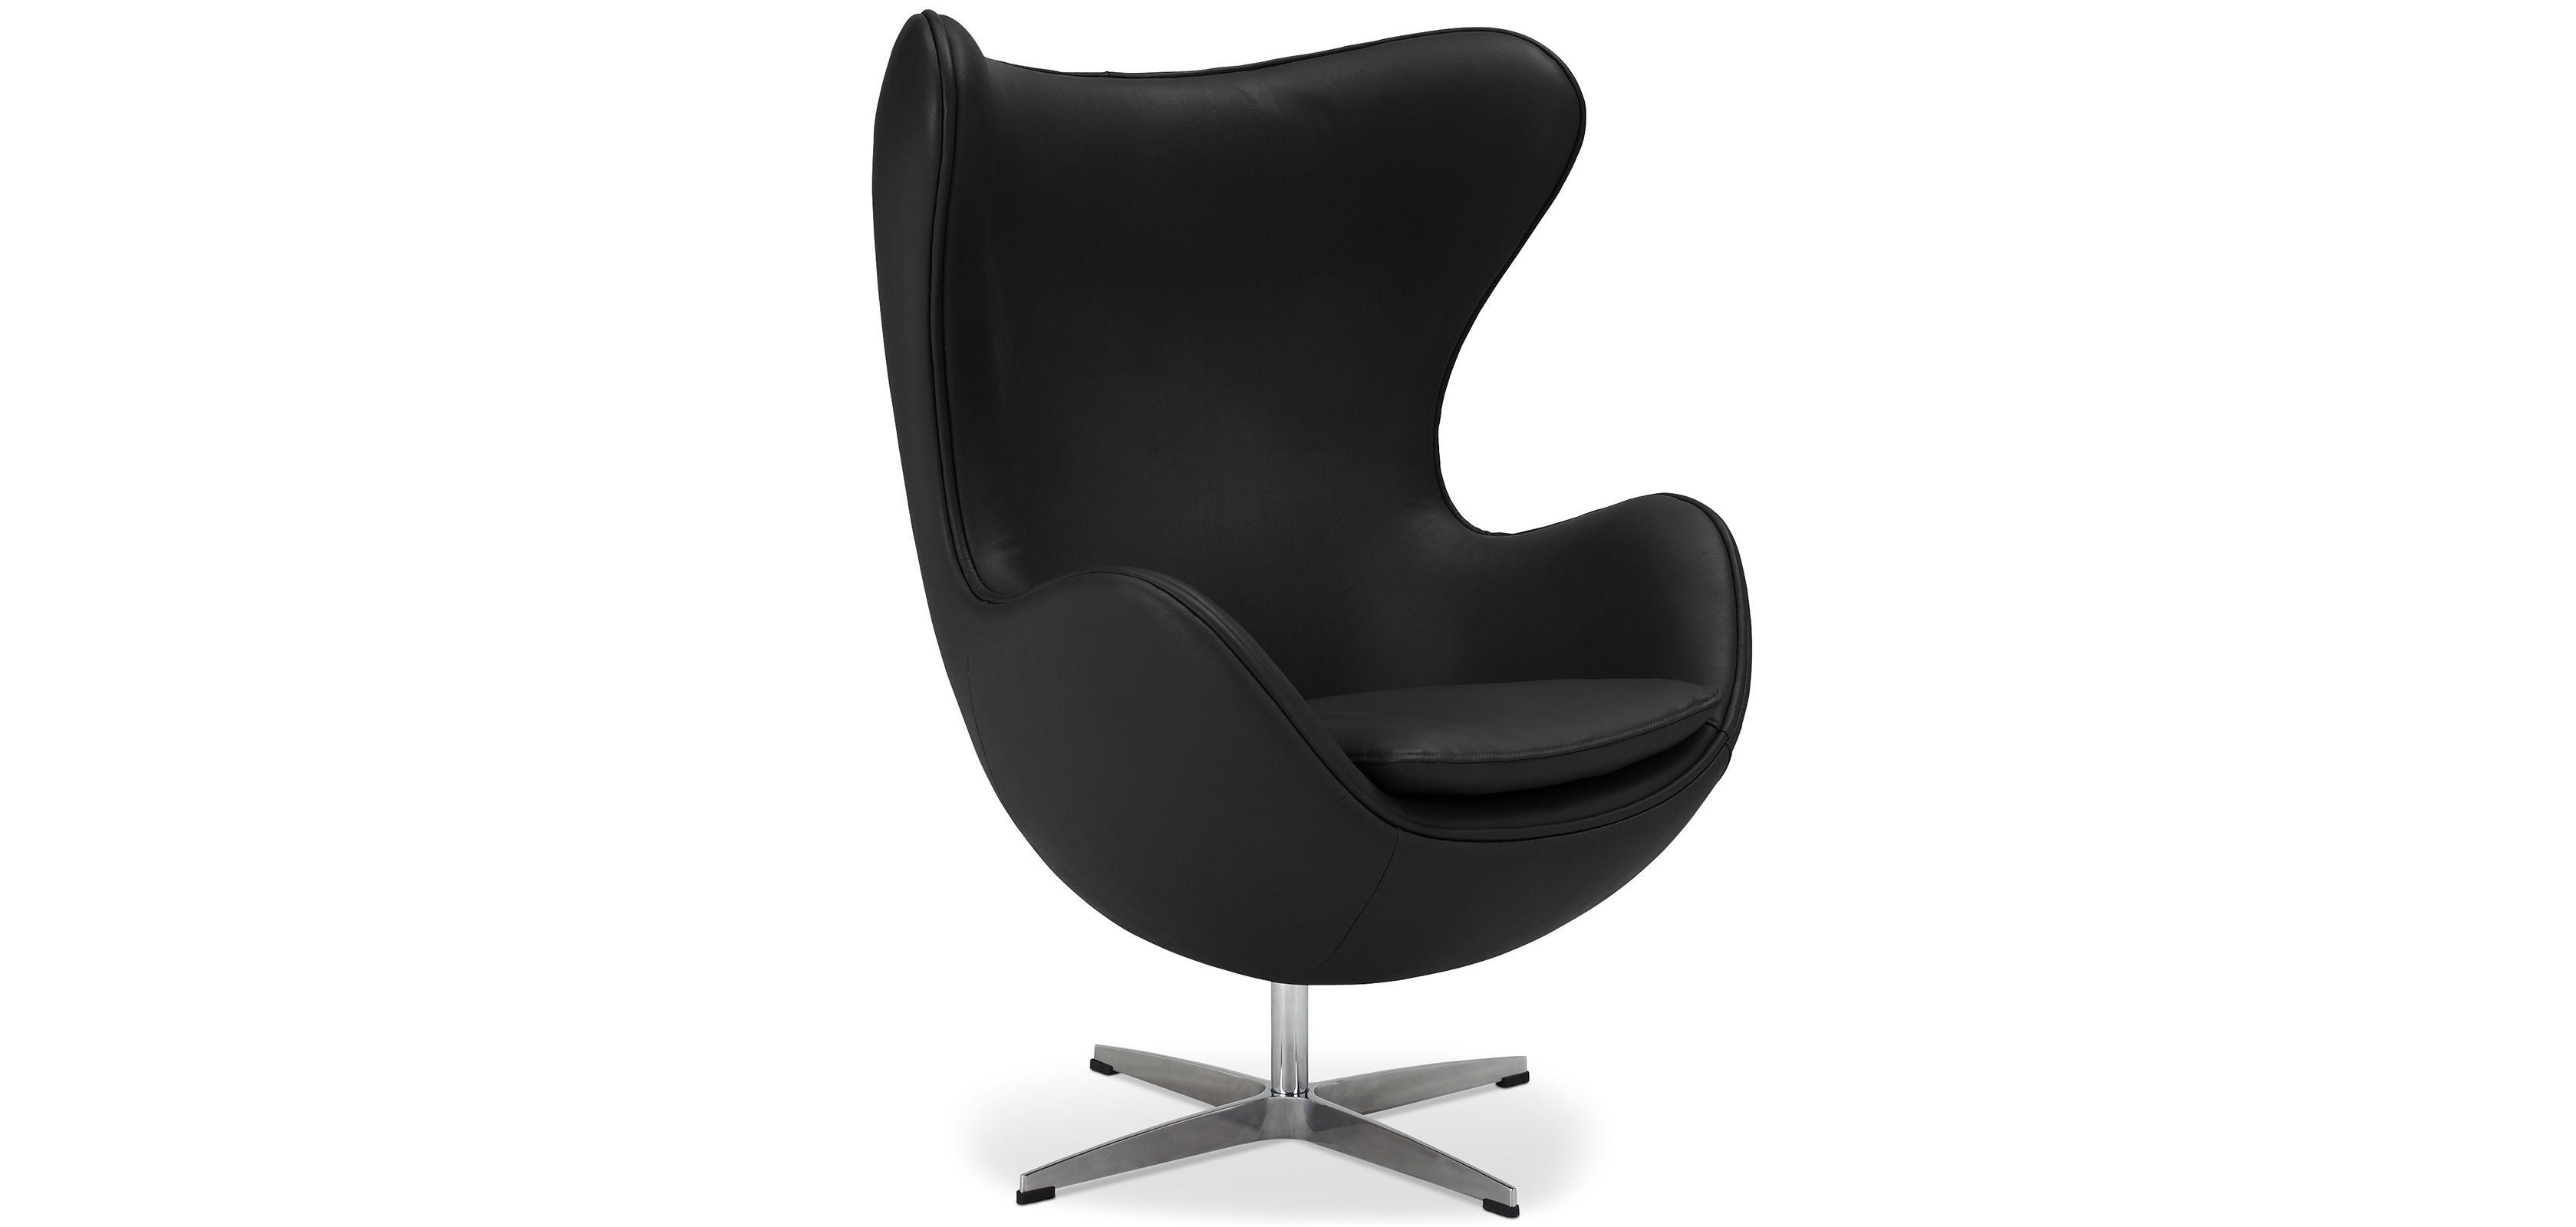 Cocoon Chair Cuir Premium Stuhl Kunstleder Egg Sessel Kunstleder